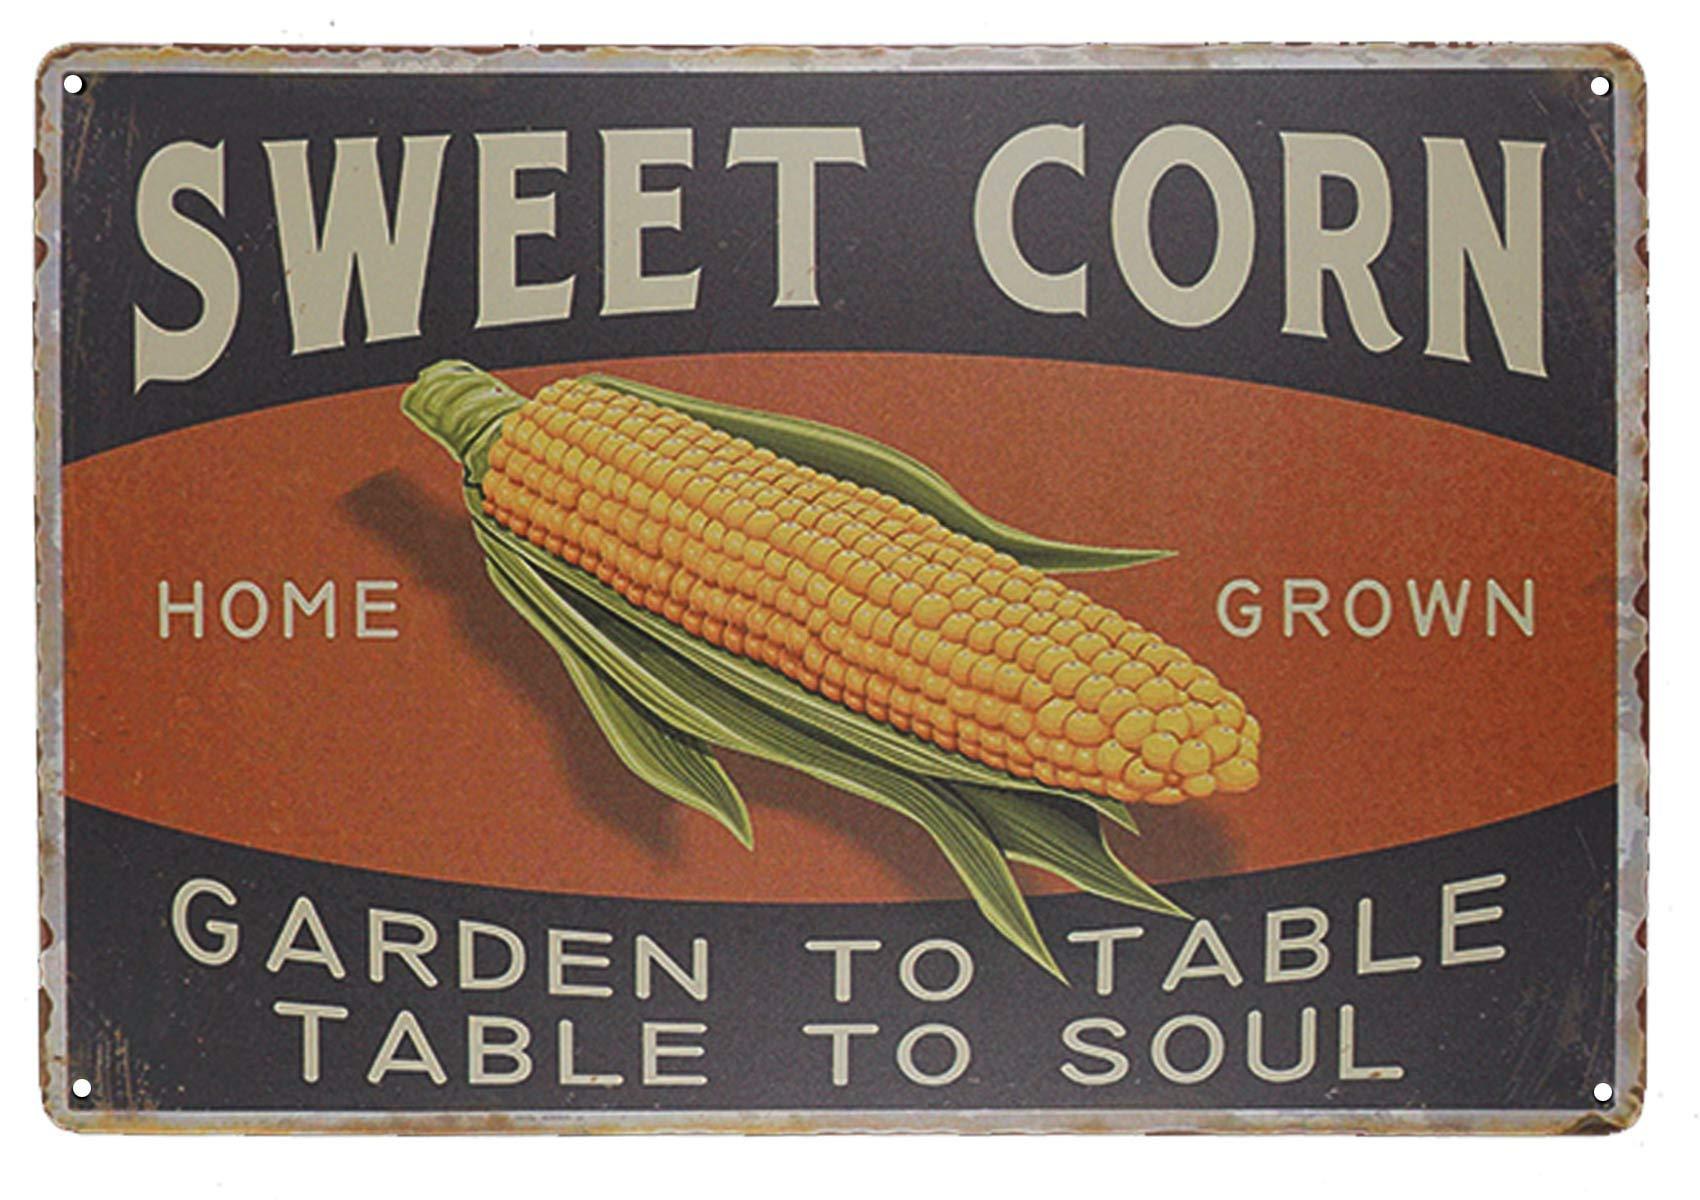 "TISOSO Sweet Corn Retro Vintage Metal Tin Sign Home Bar Kitchen Farmhouse Home Decor Signs Gifts Size 8"" X 12""(Garden to Table Table to Soul)"